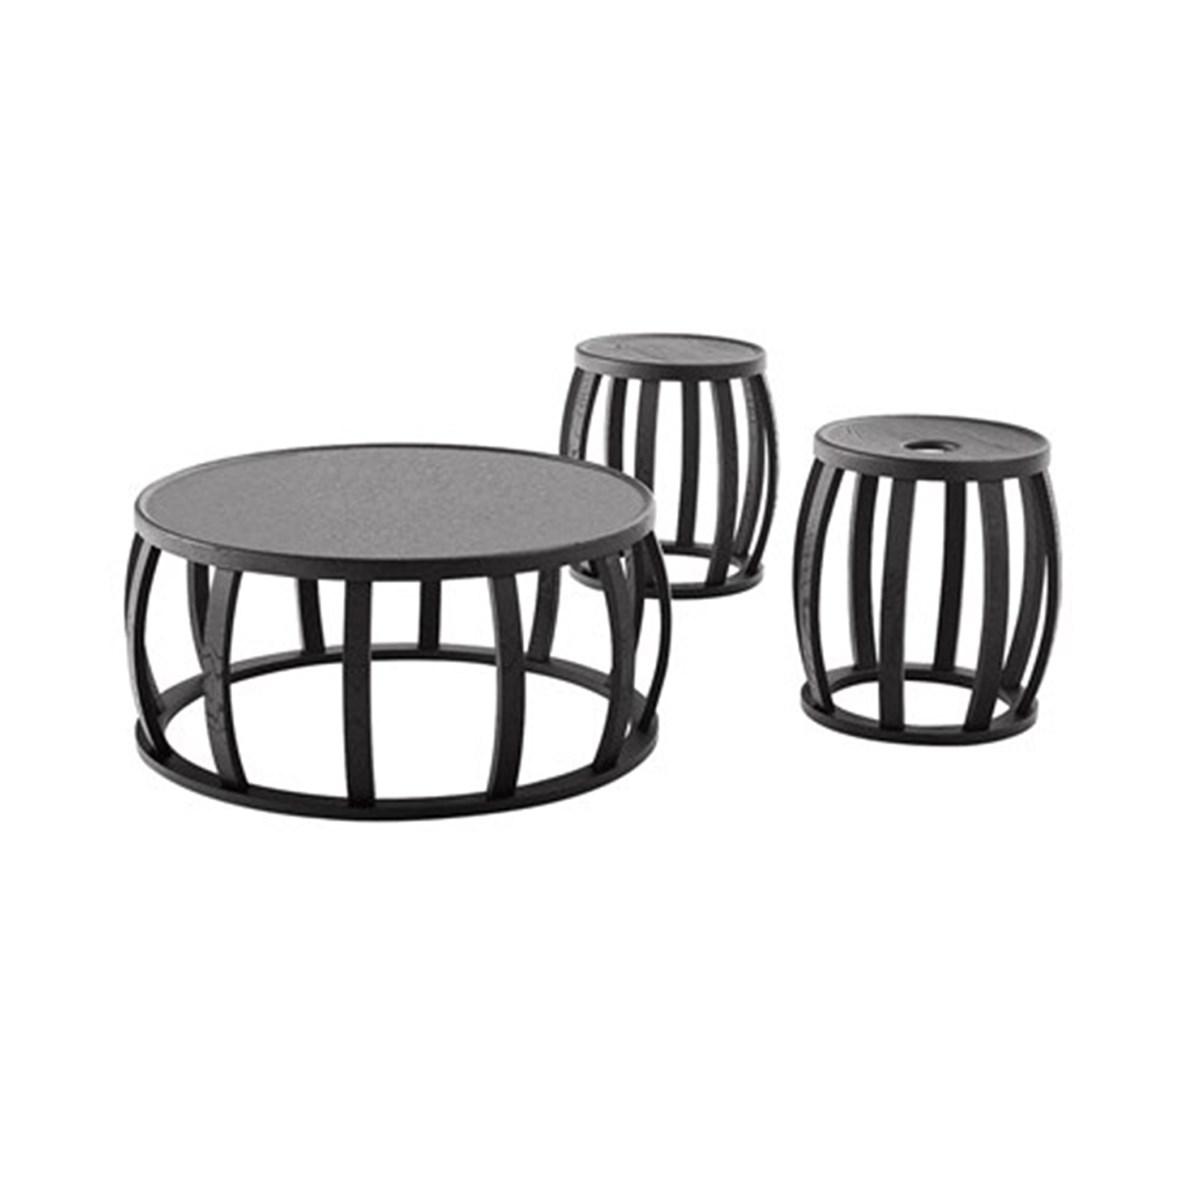 Maxalto-Antonio-Citterio-Loto-Table-Matisse-1